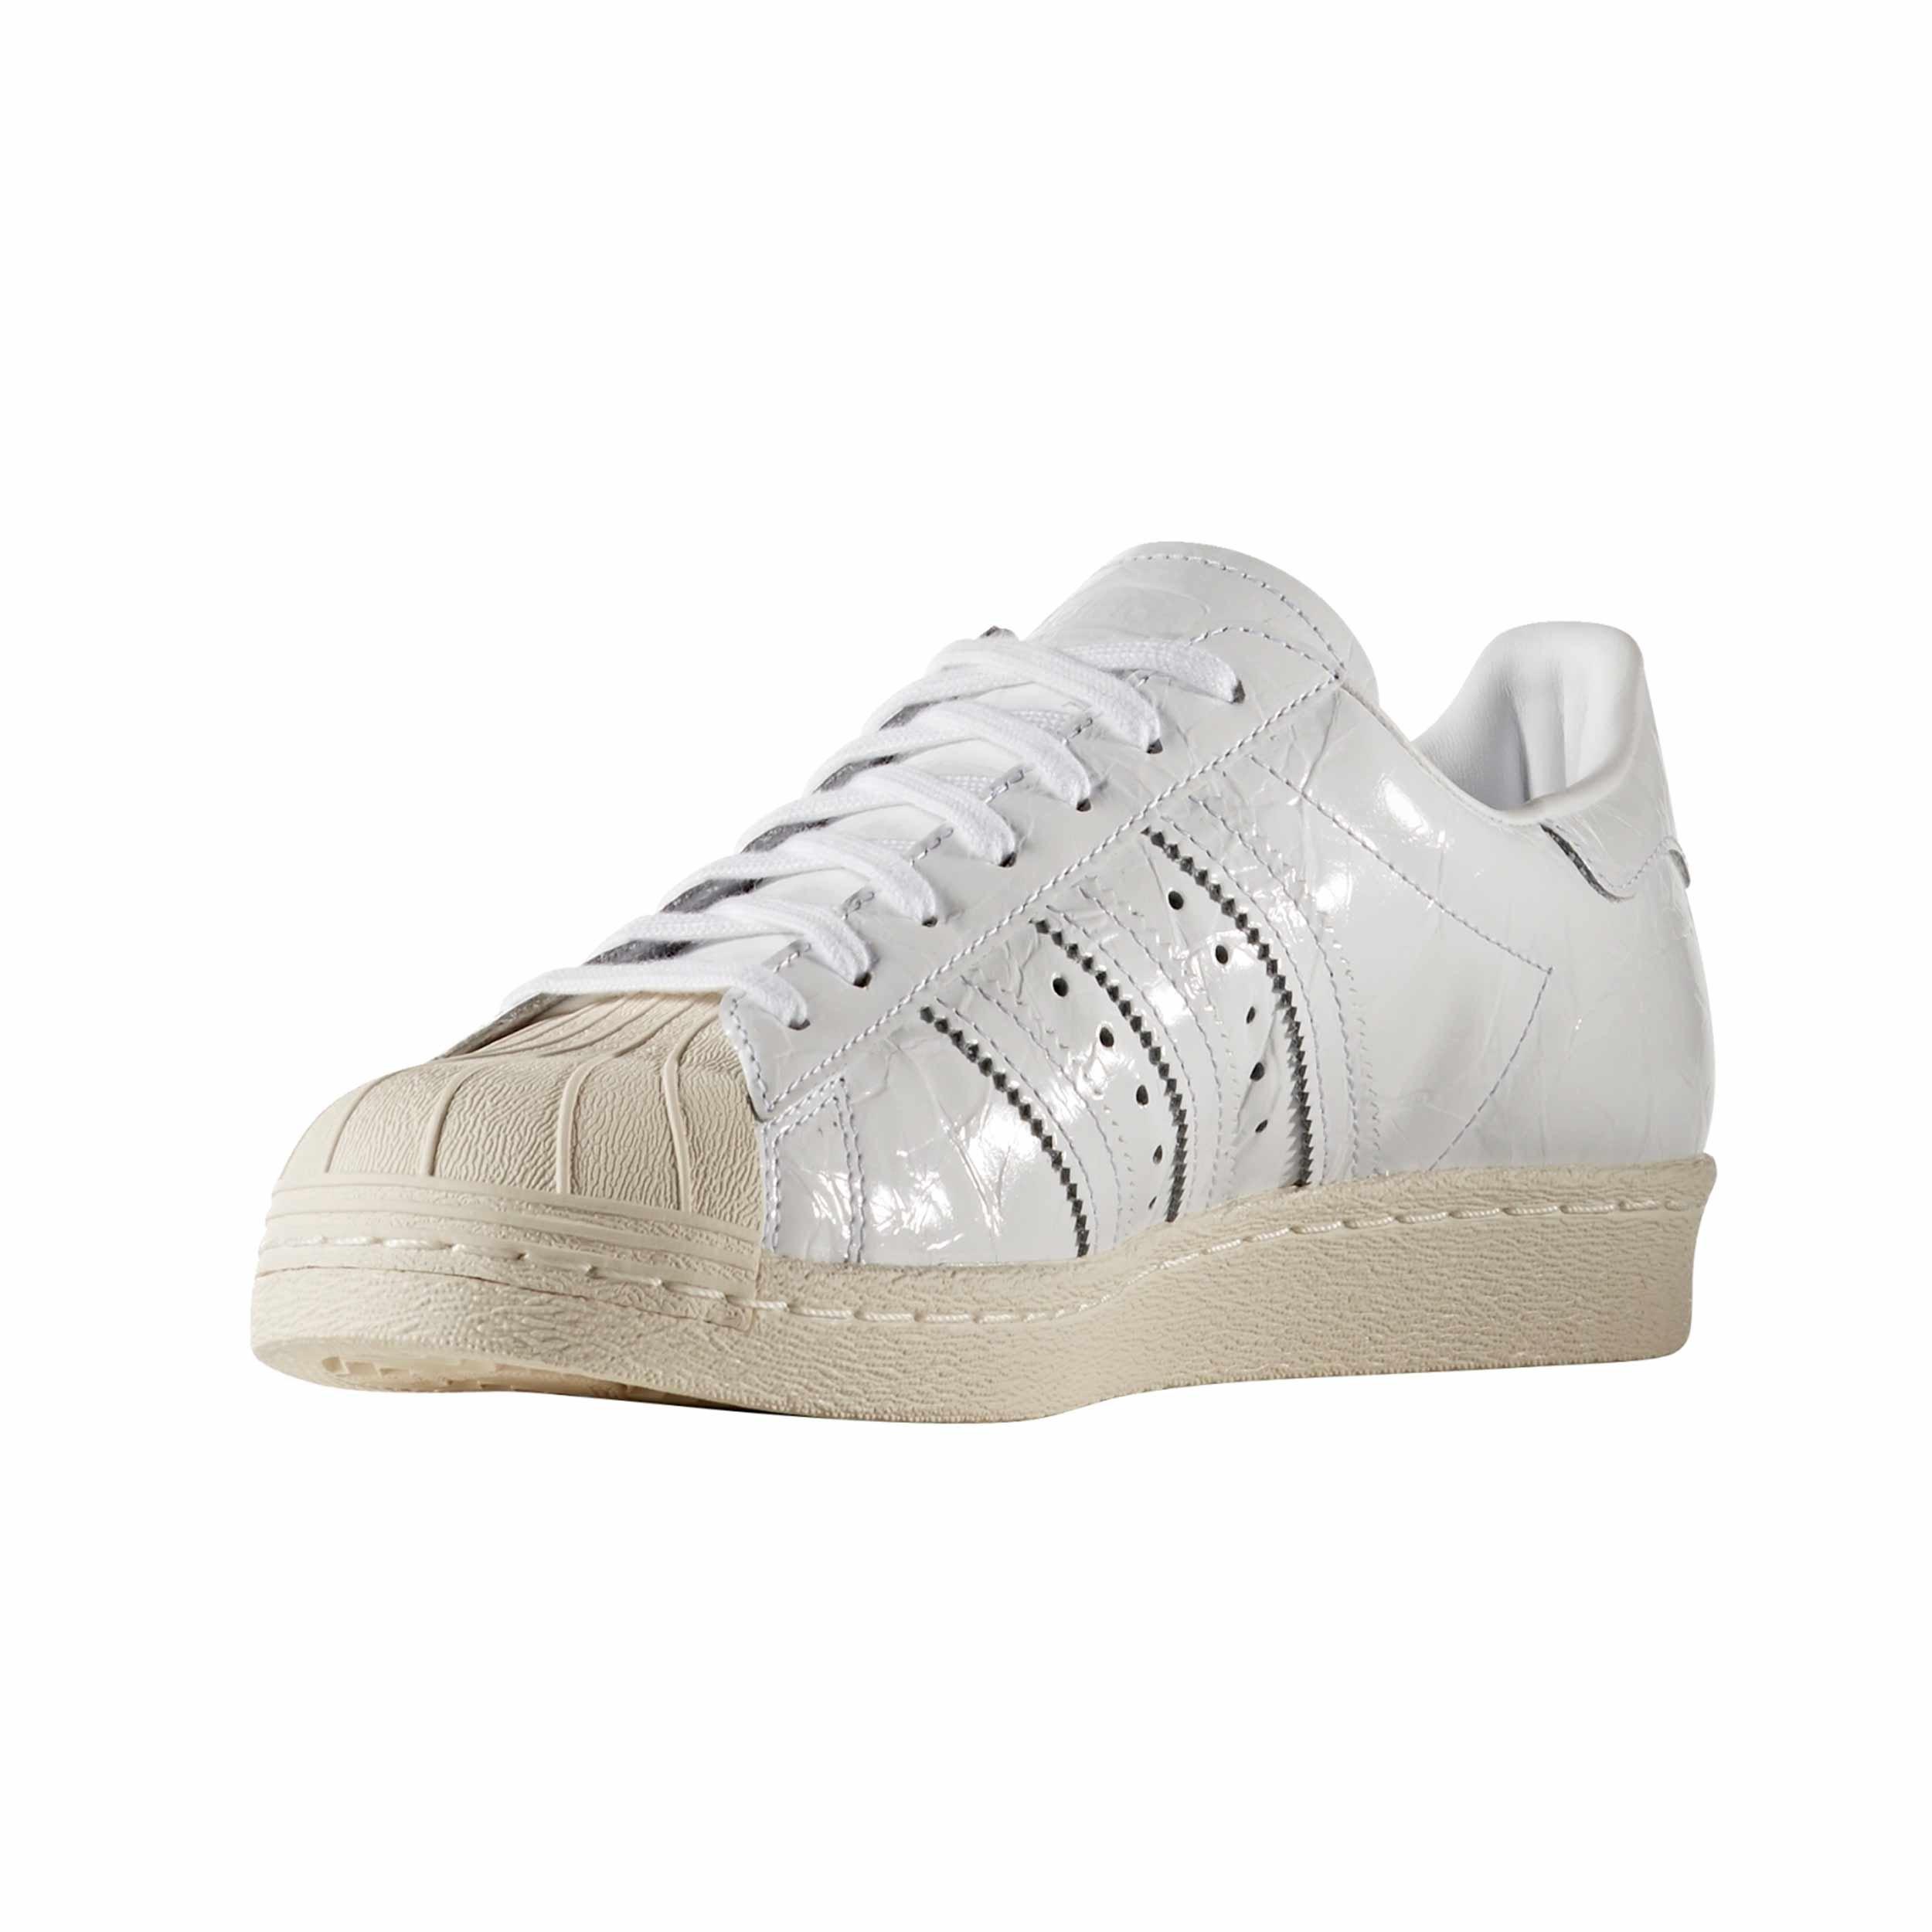 Adidas Superstar 80s Herren Weiß Hausschuhe Trainer Sneaker Lackleder , BB2056 Zake (44 EU - 9.5UK,)